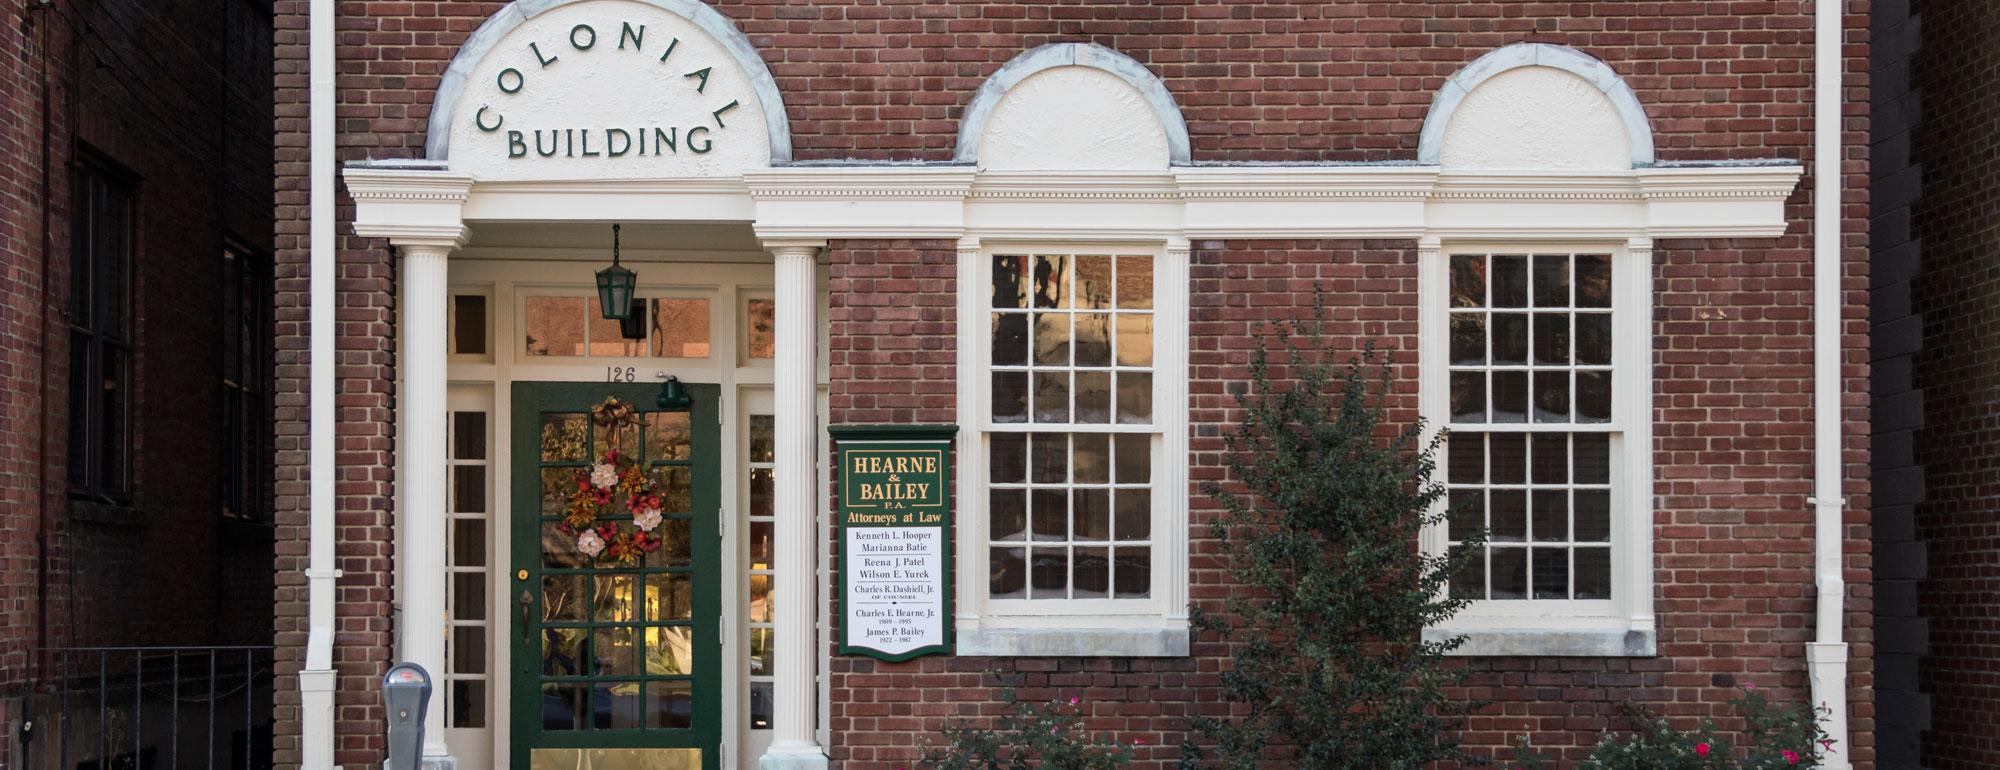 Salisbury Maryland Chamber of Commerce | Business Opportunities